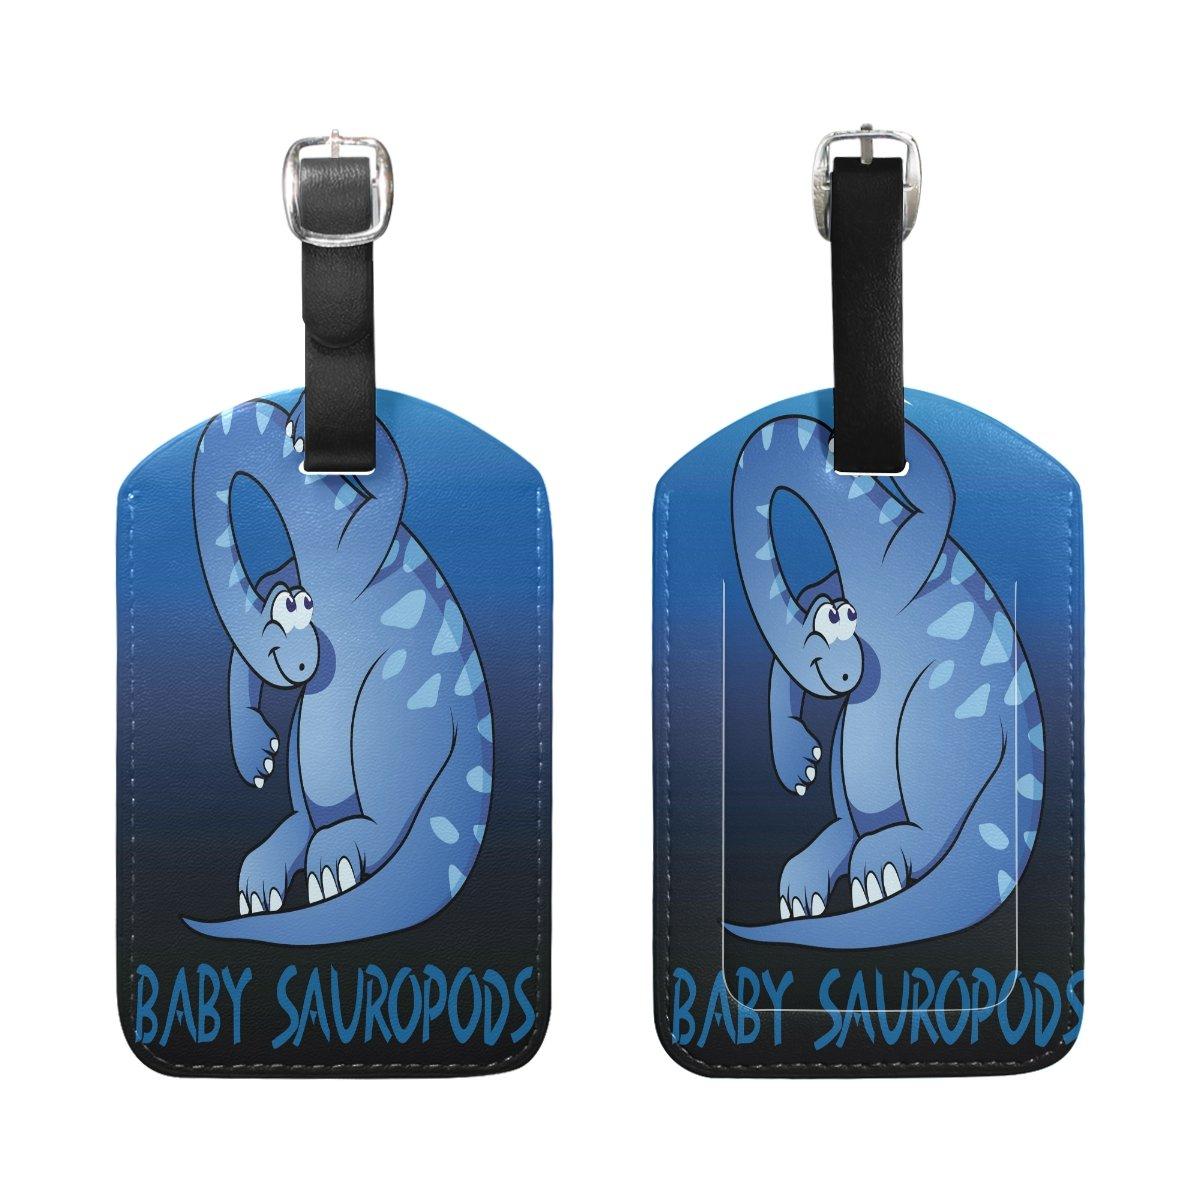 1Pcs Saobao Travel Luggage Tag Dinosaur Baby Sauropods PU Leather Baggage Suitcase Travel ID Bag Tag